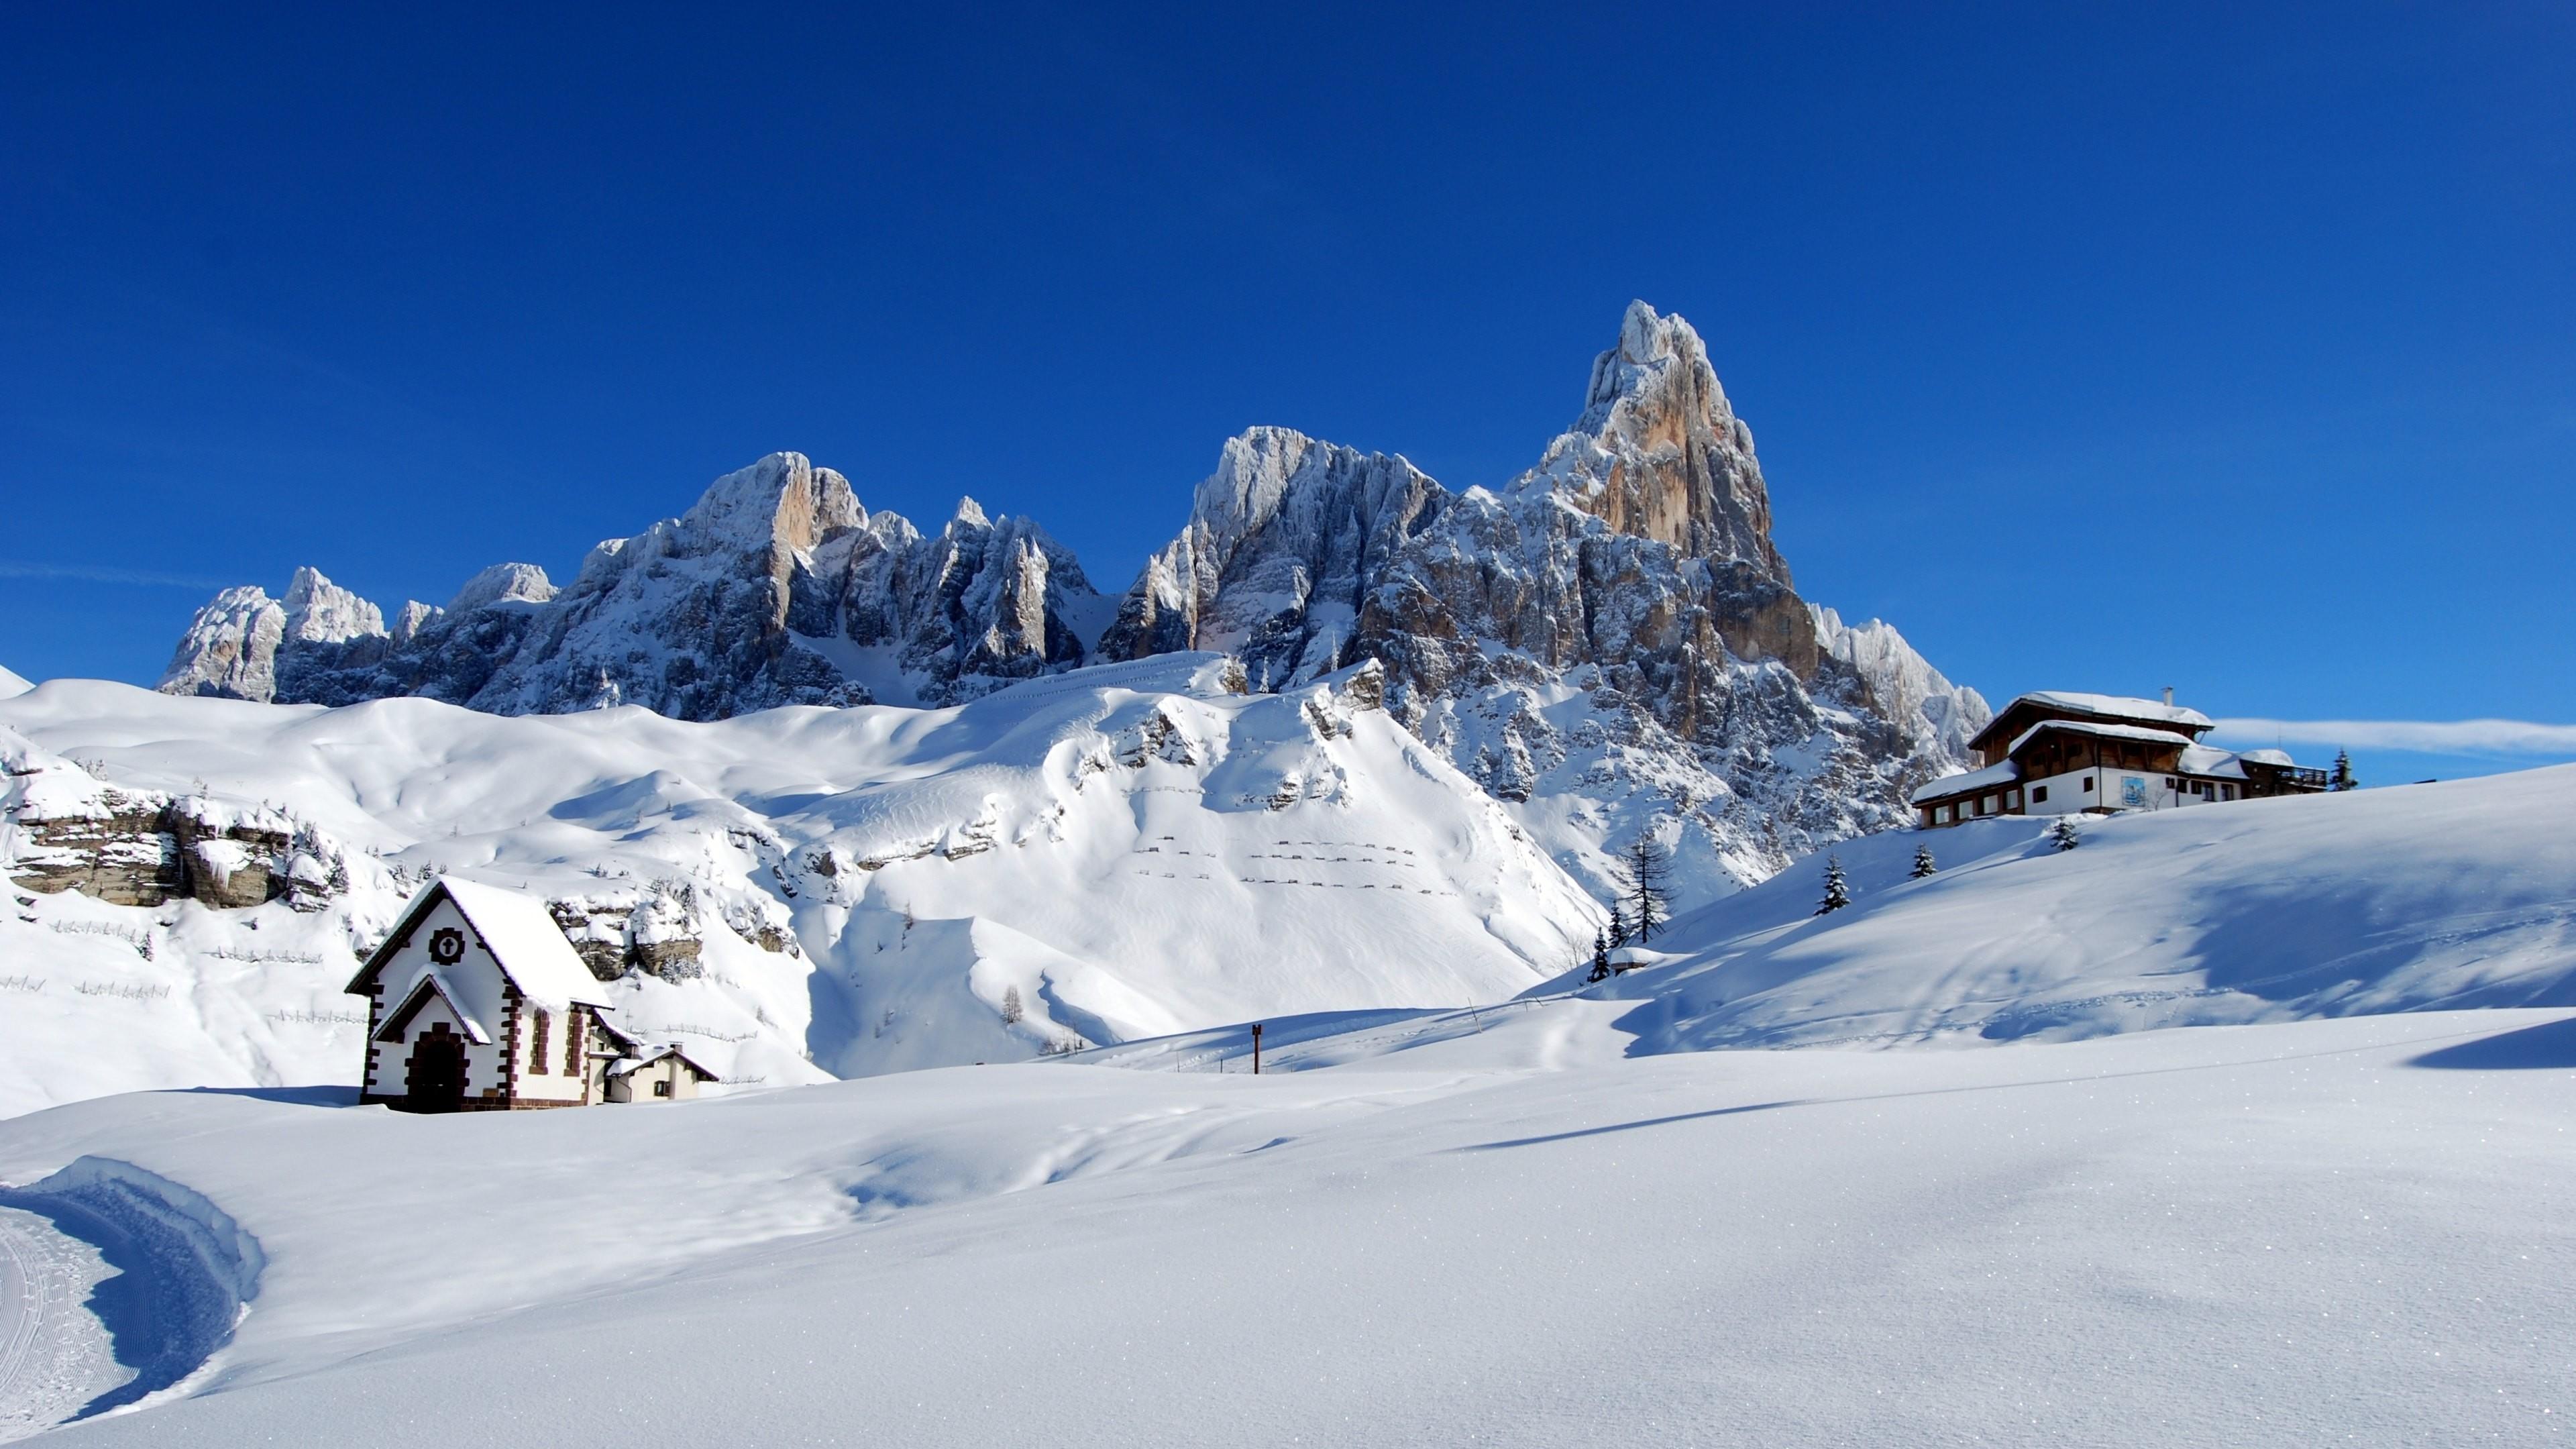 4K HD Wallpaper: Dolomites. Alps Italy. Winter Snow